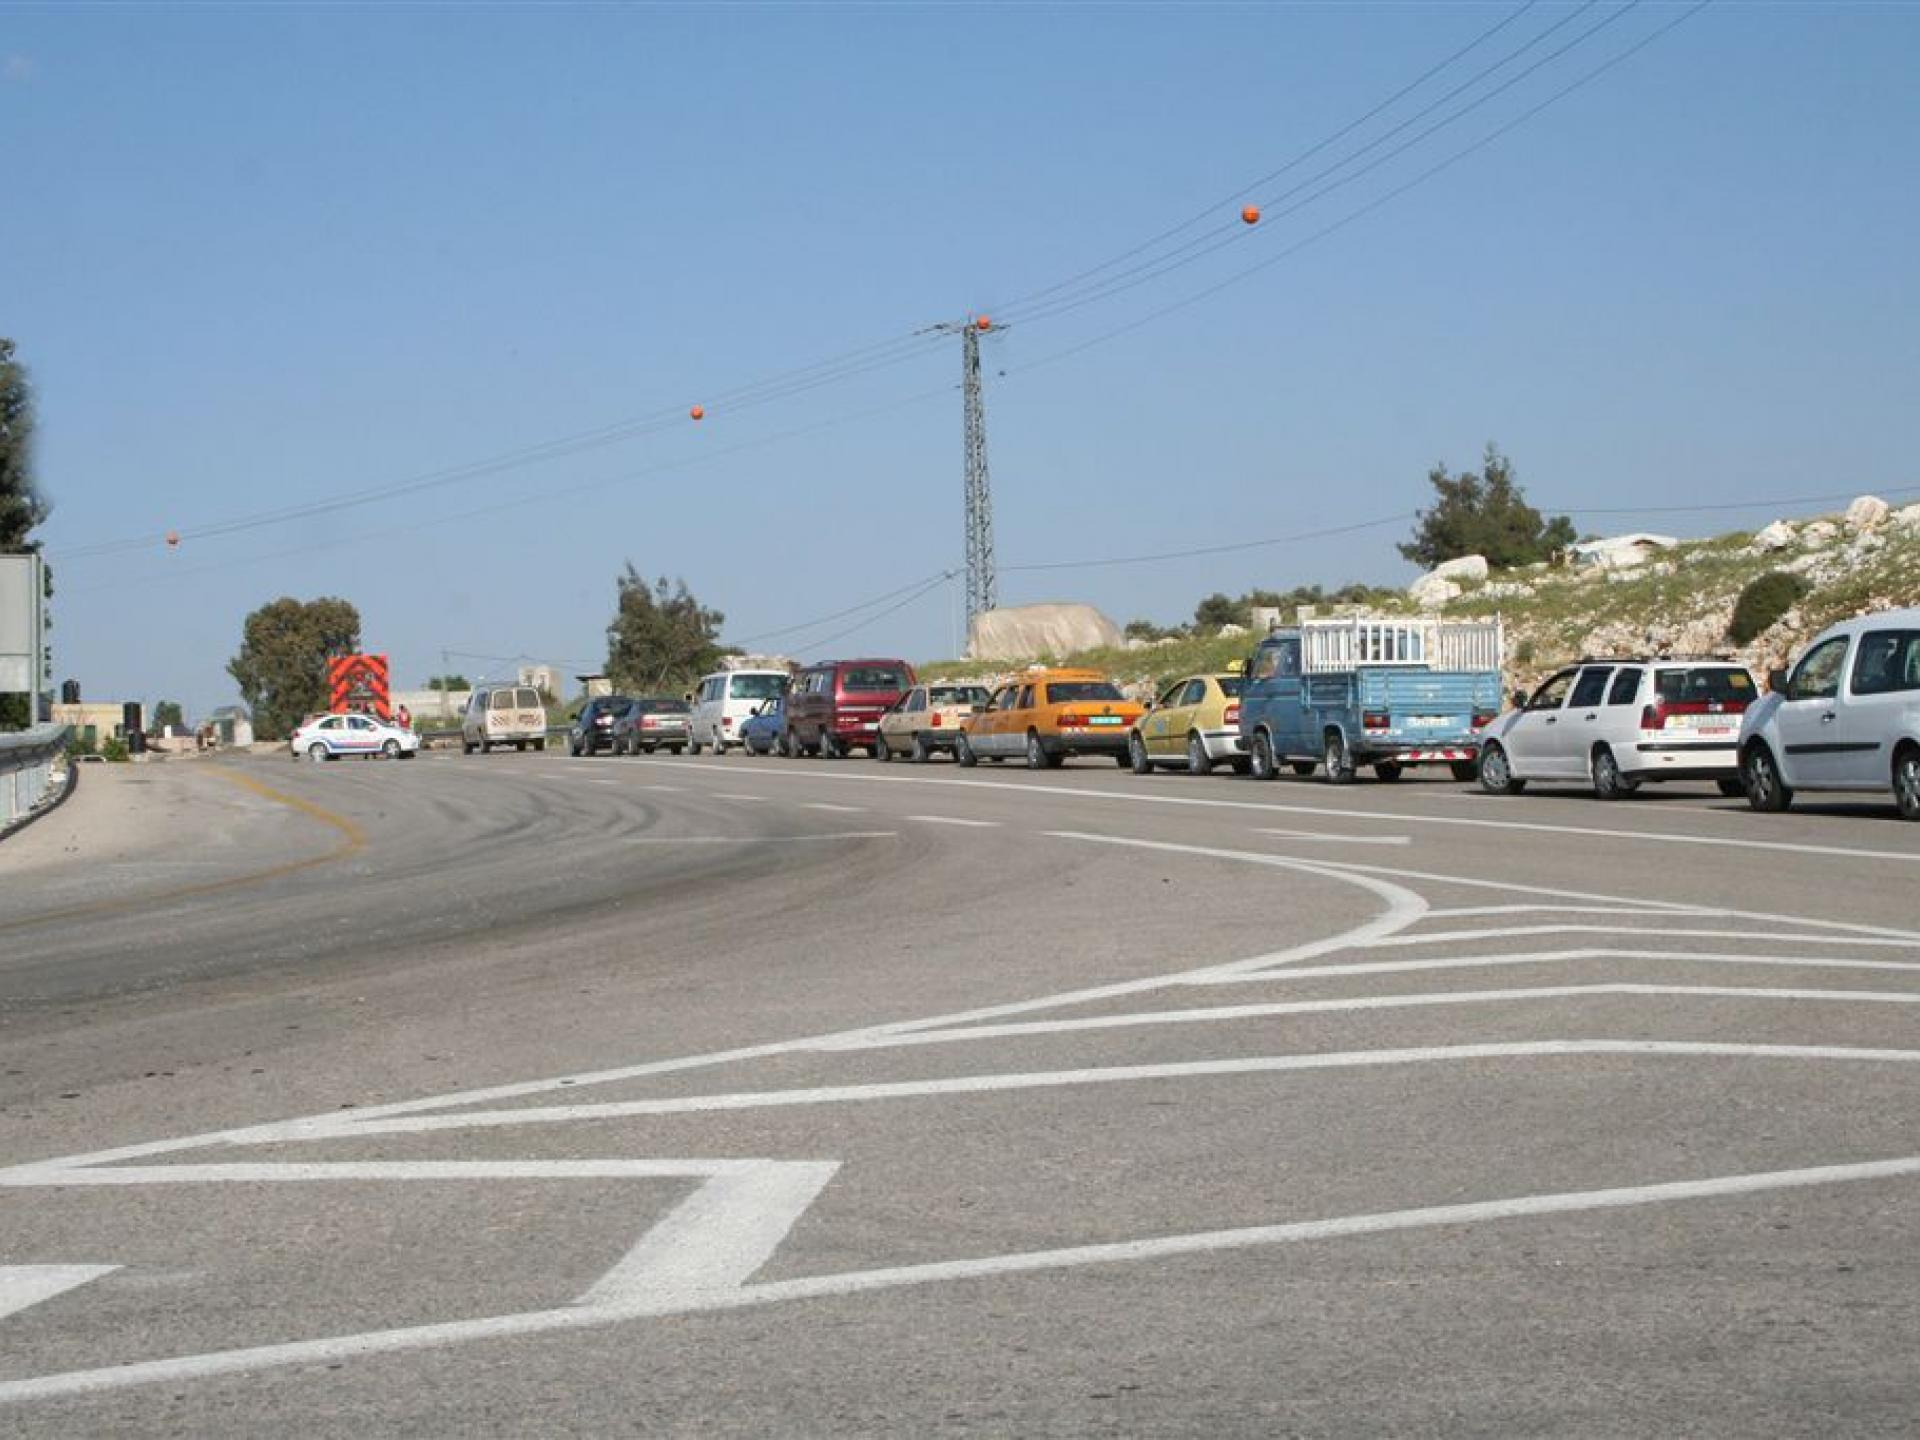 Tura/Shaked checkpoint 13.04.10